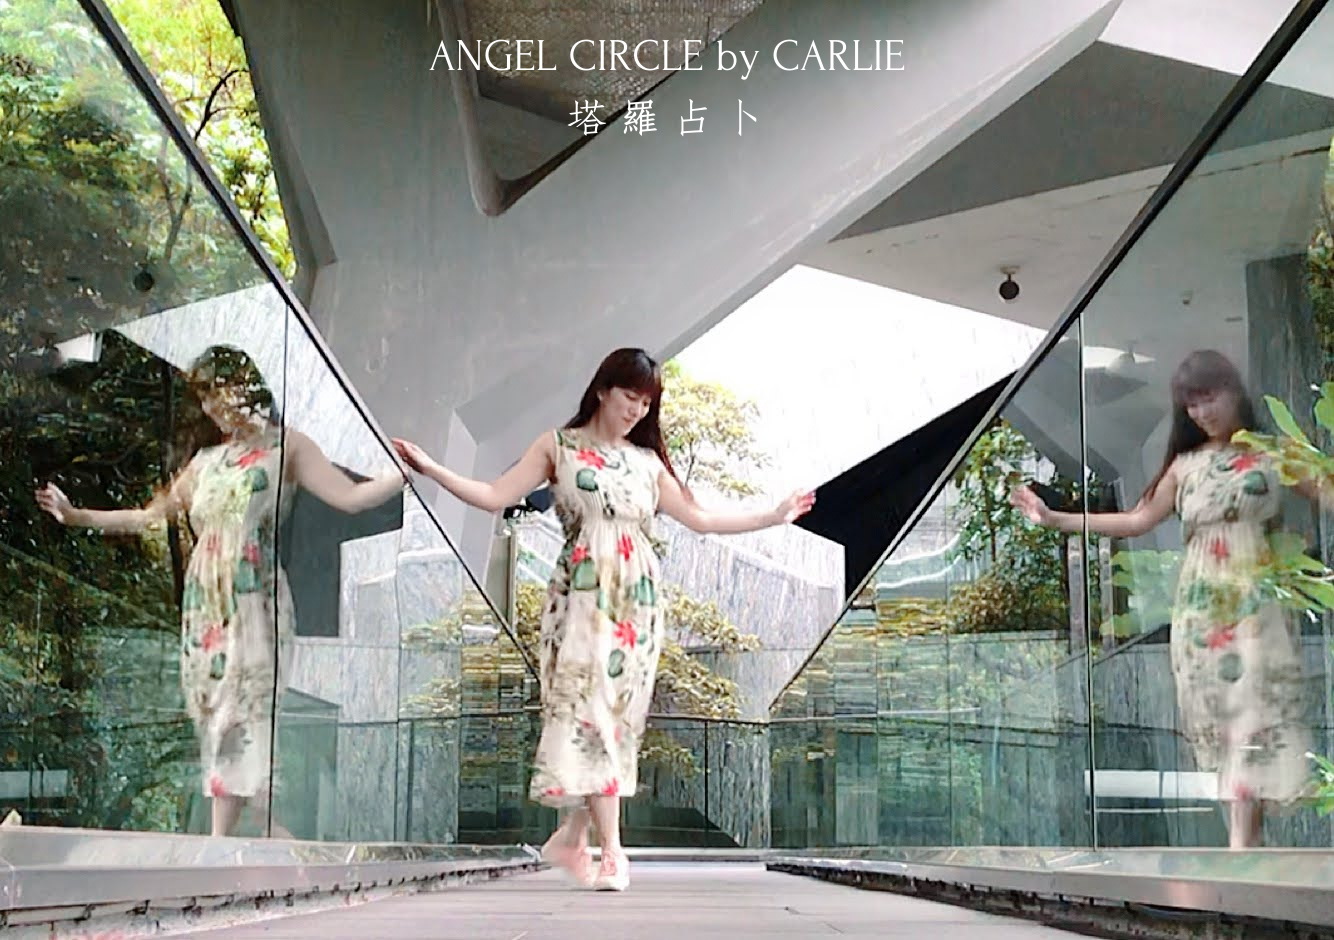 FAQ angel circle carlie tarot hong kong distant consulting香港電話網上面對面塔羅占卜